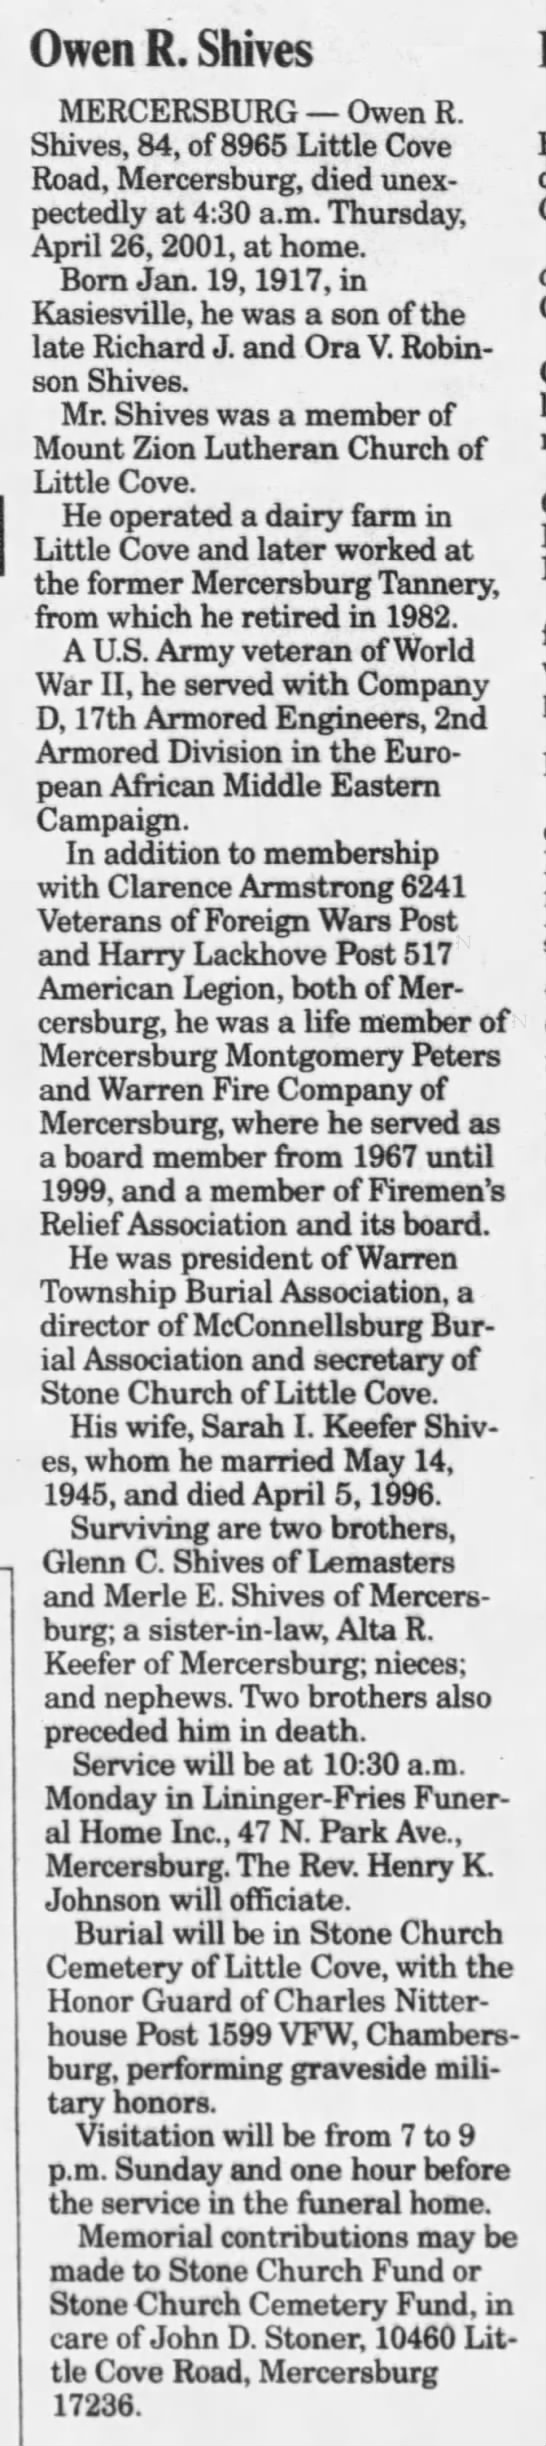 Owen R Shives Public Opinion (Chambersburg, Pennsylvania, United States of America) · 28 Apr 2001